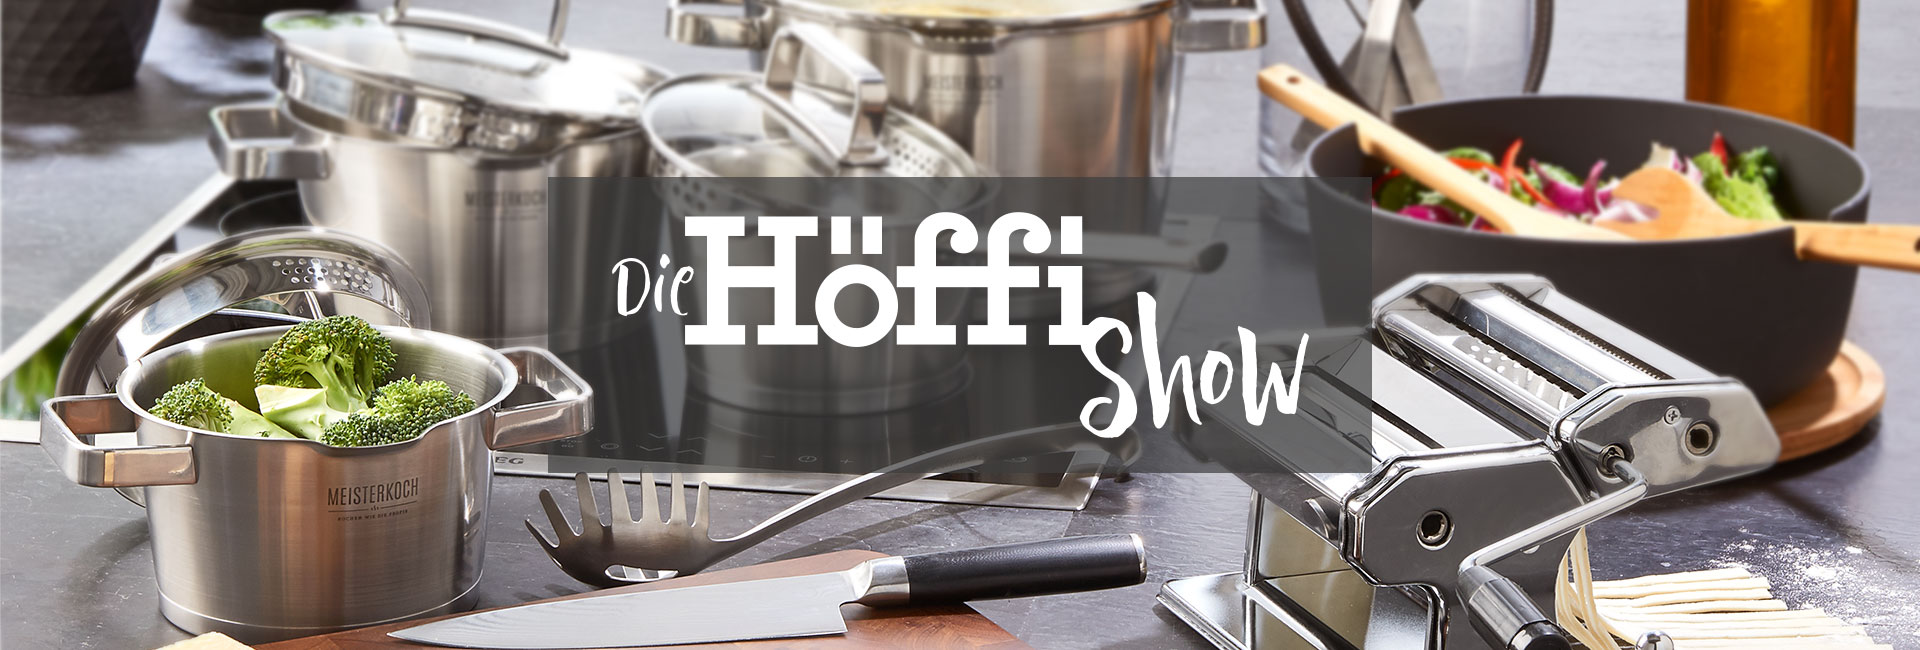 Die Höffi Show: Meisterkoch Dinner 1